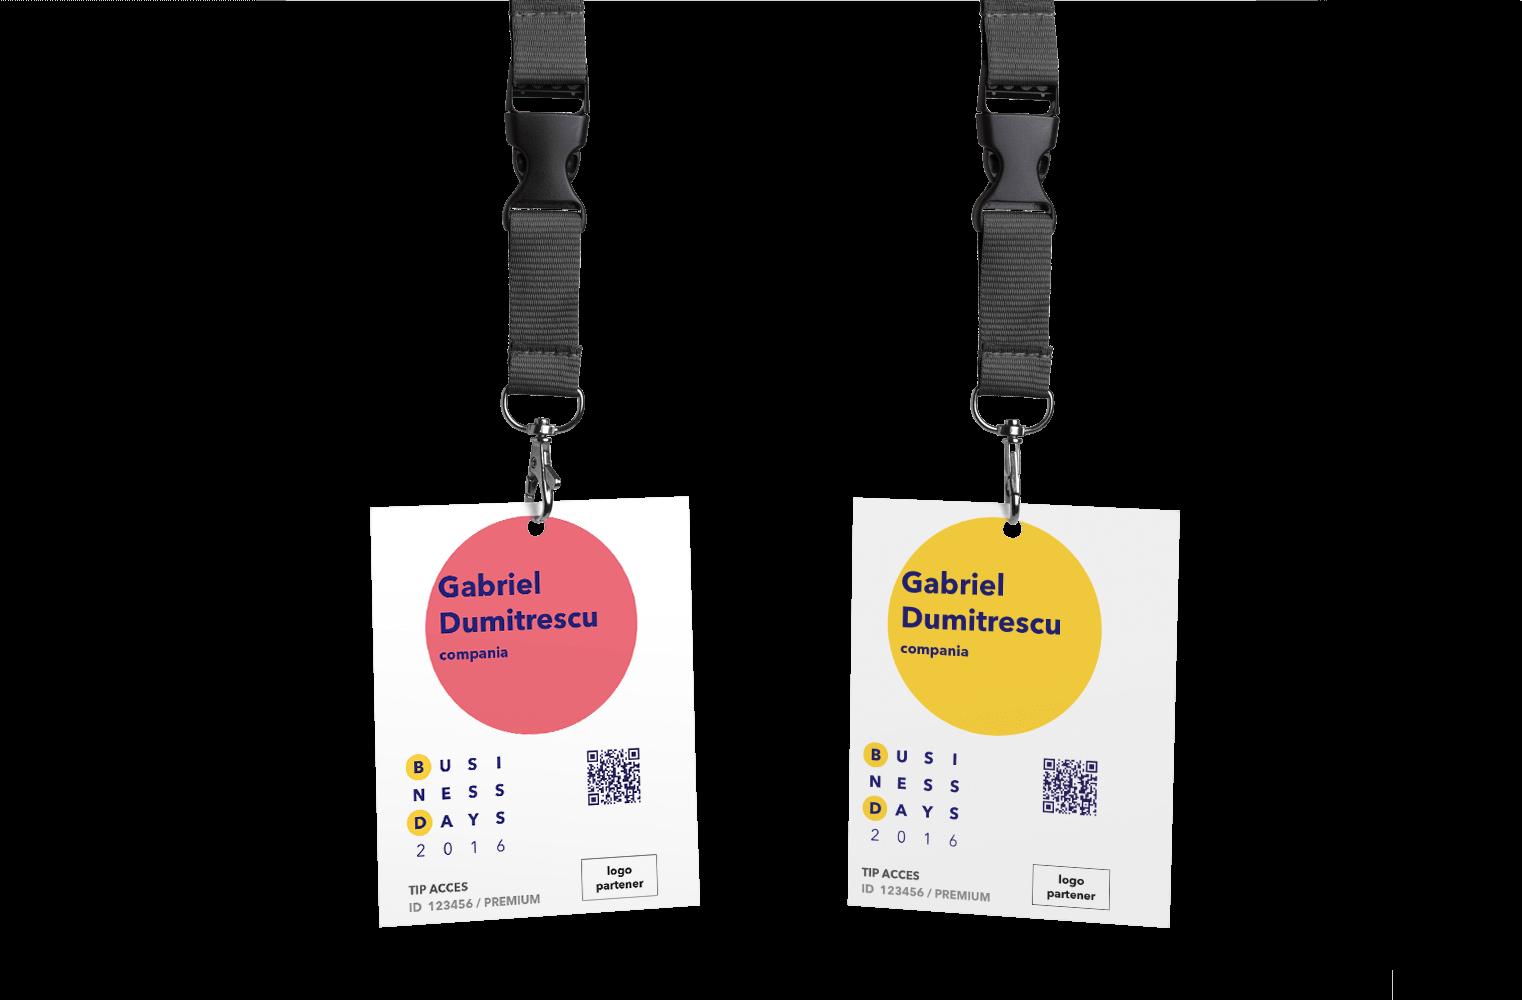 bd-card-badge